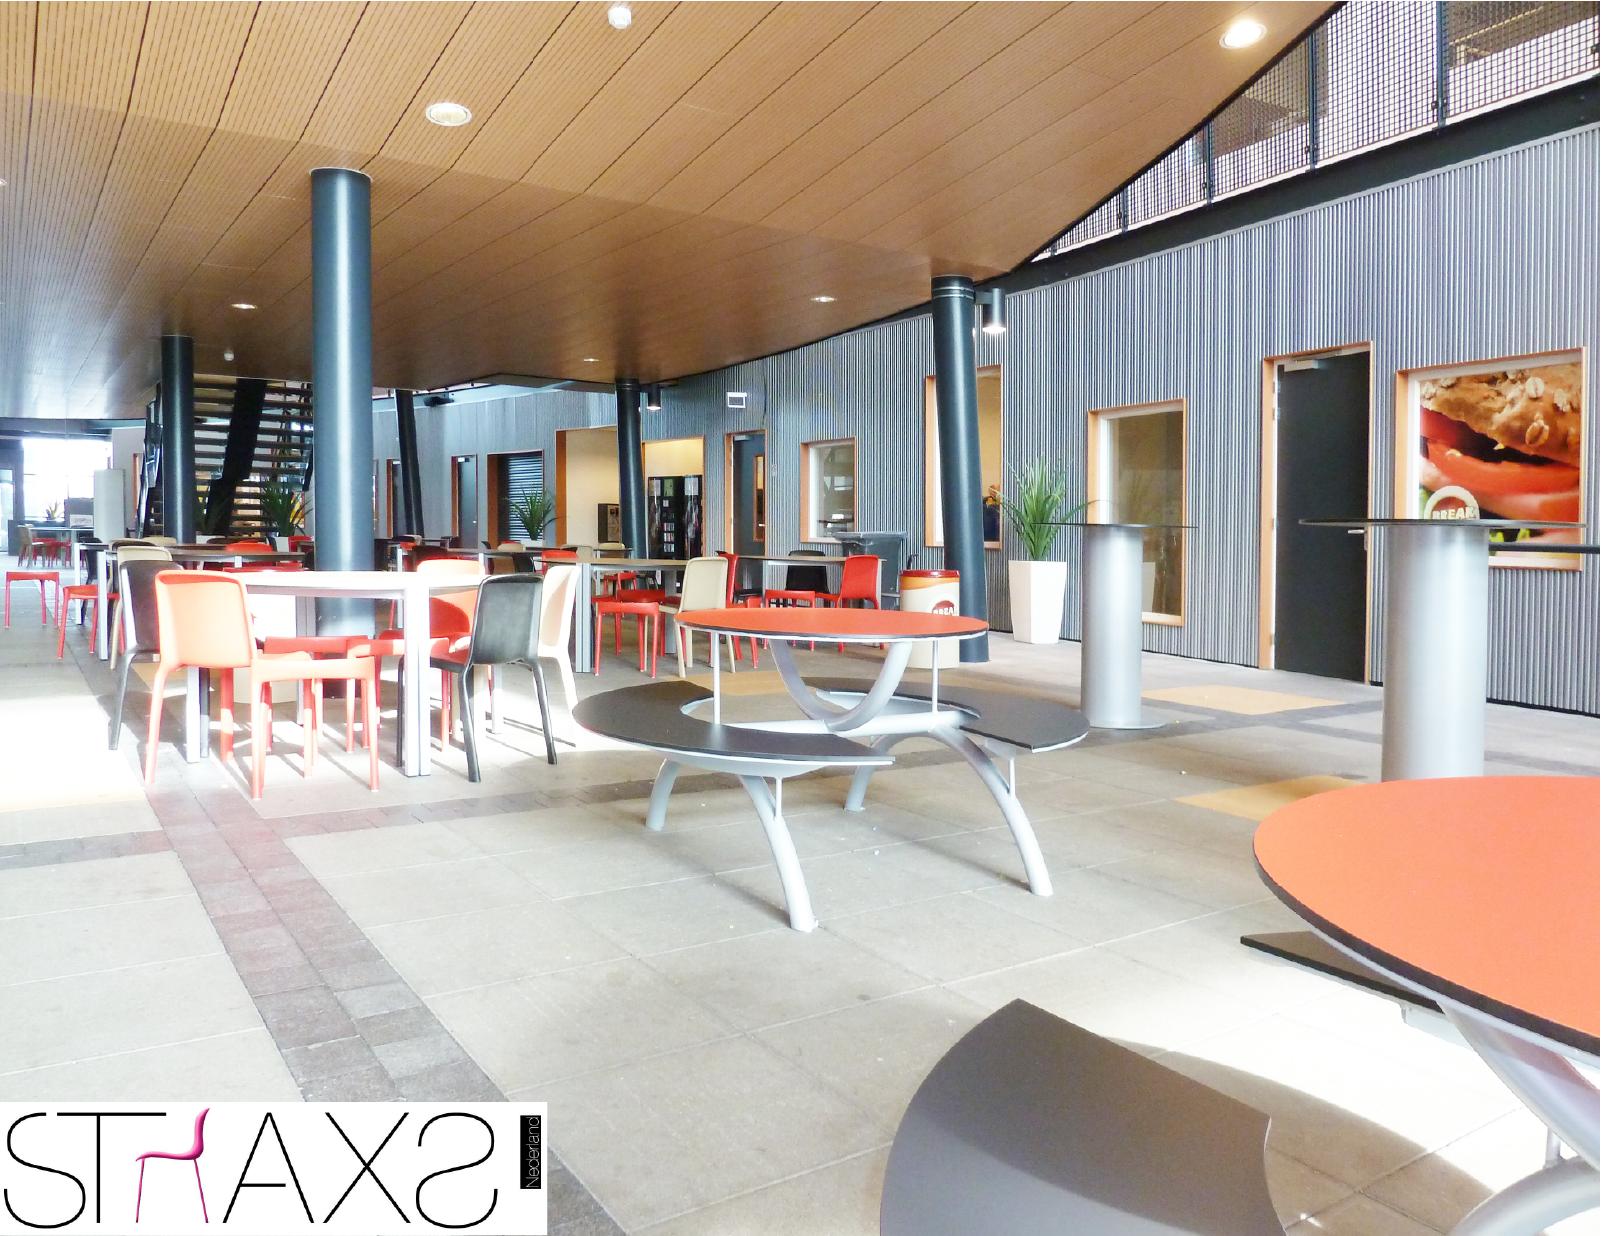 Straxs Nederland | Gerrit Komrij College | Hal | Kantine | School ...